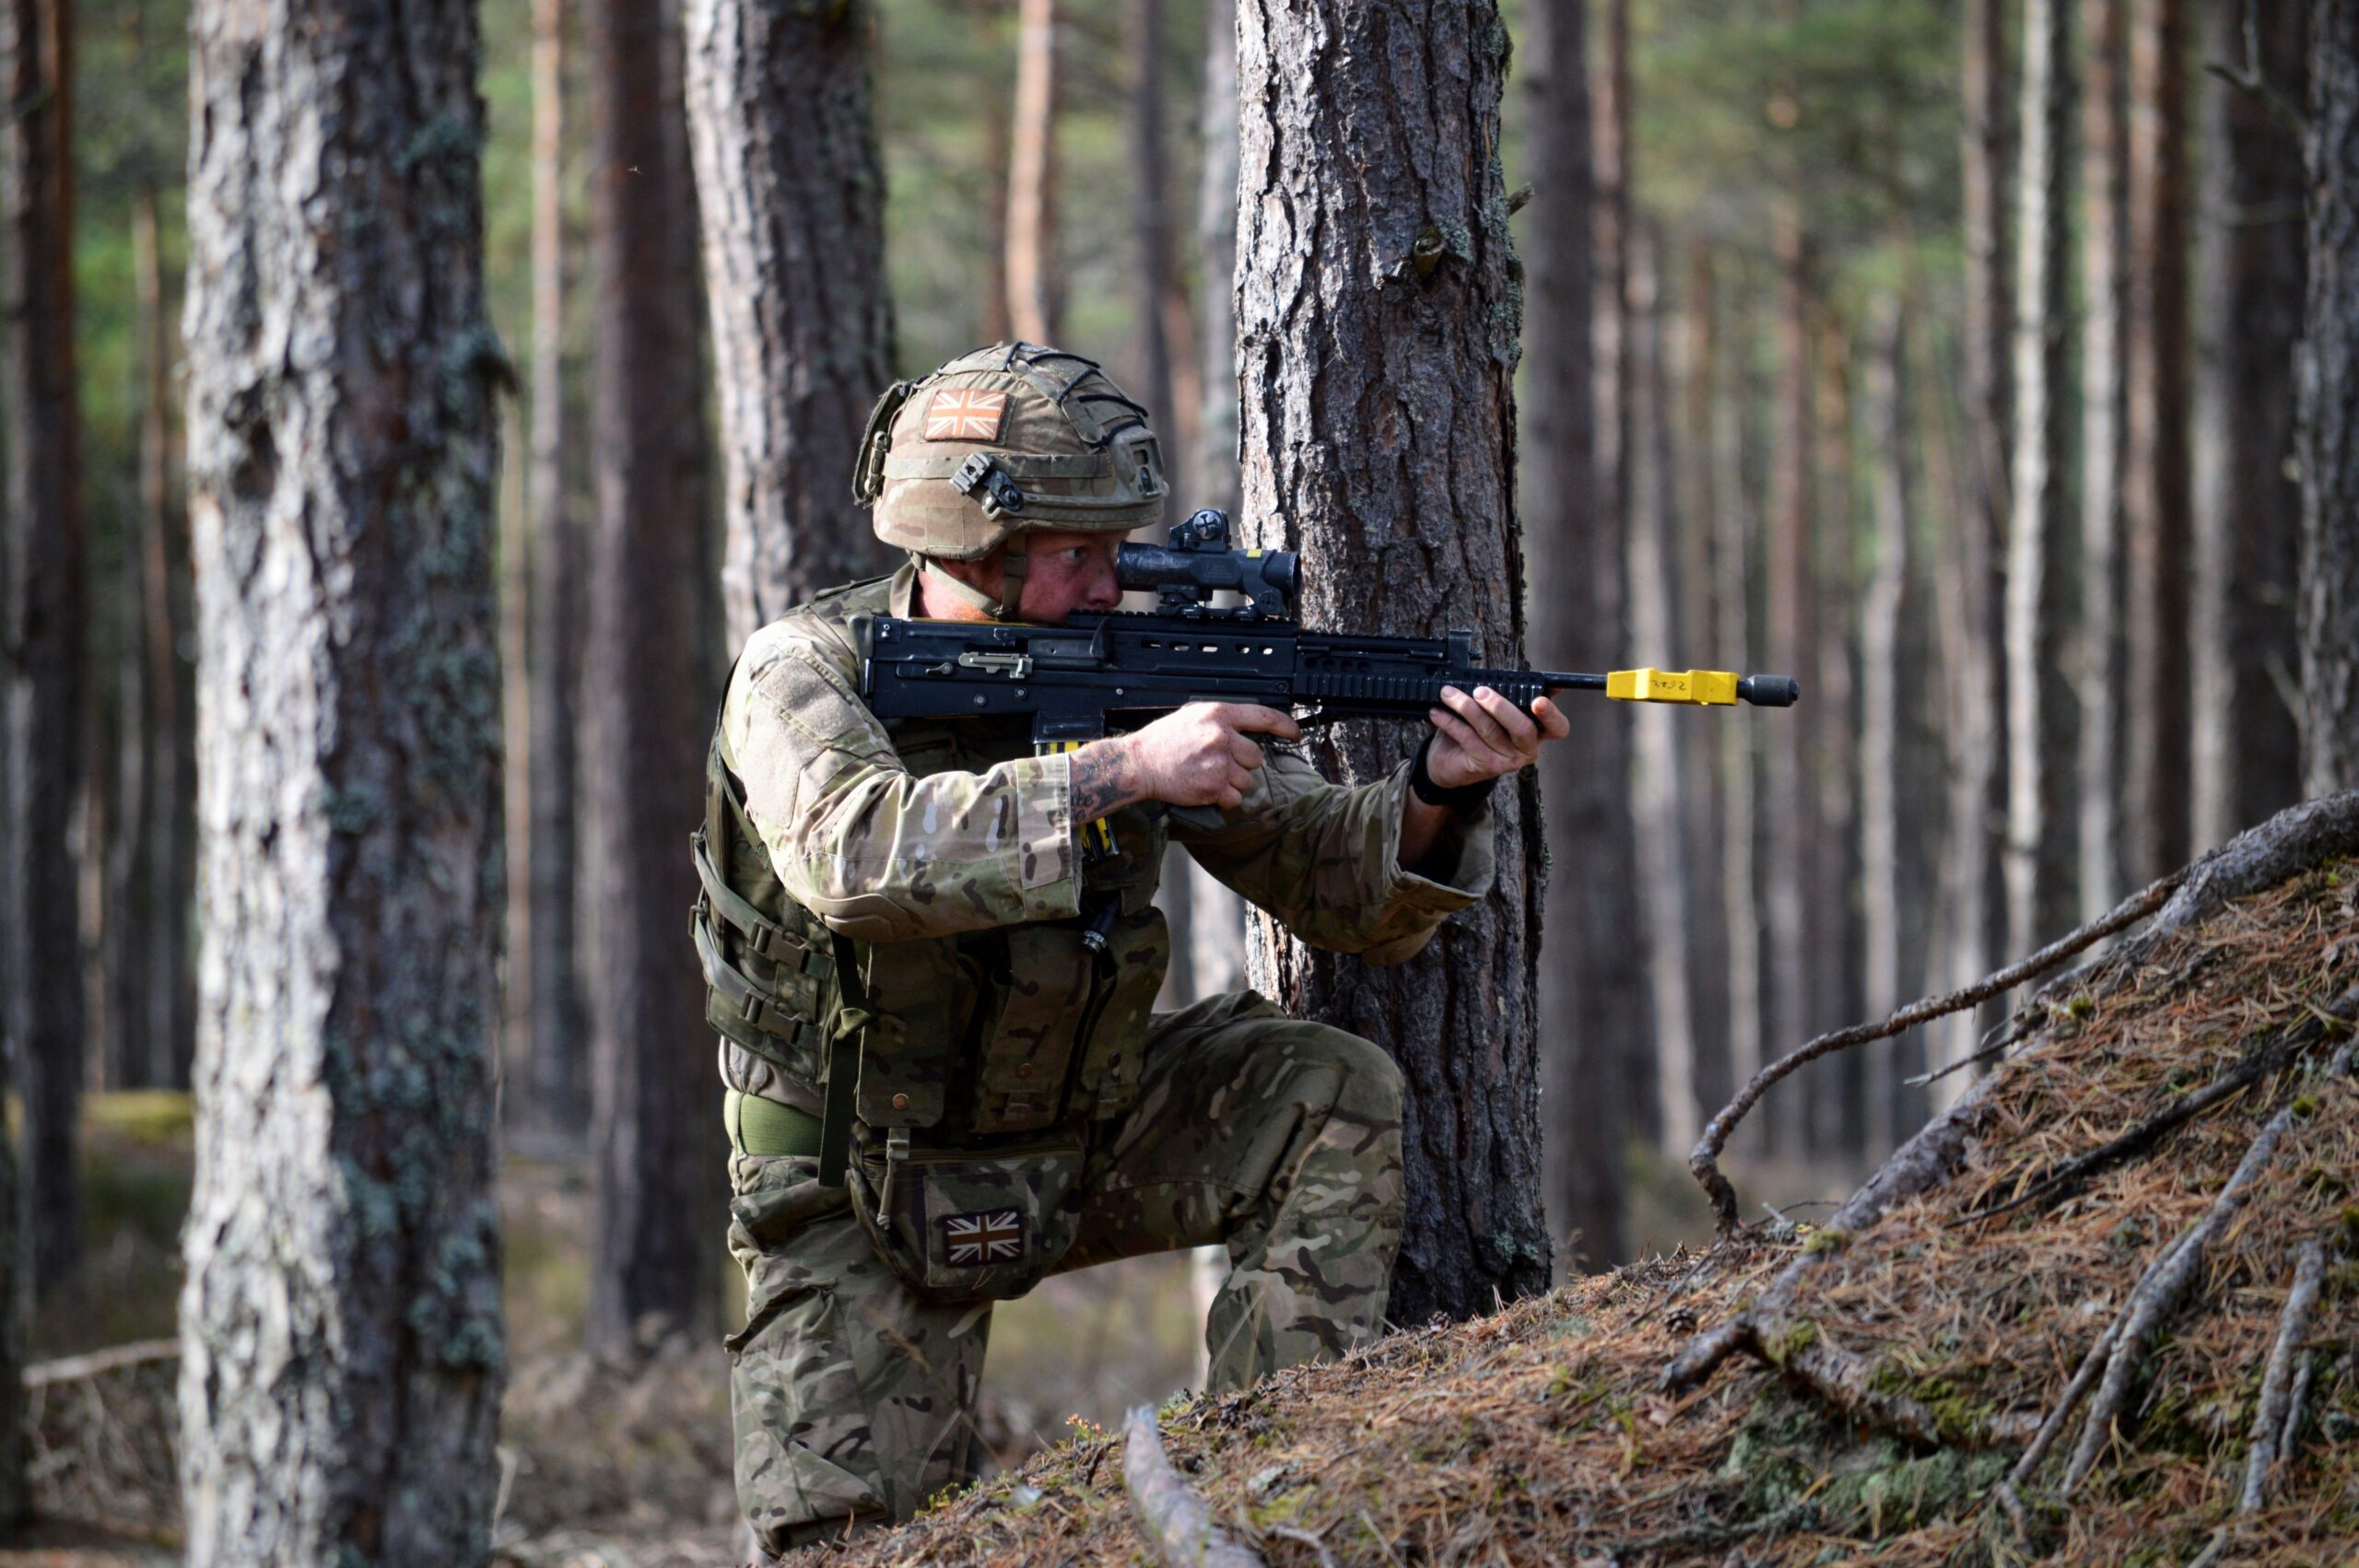 Man dressed in camouflage crouching holding gun